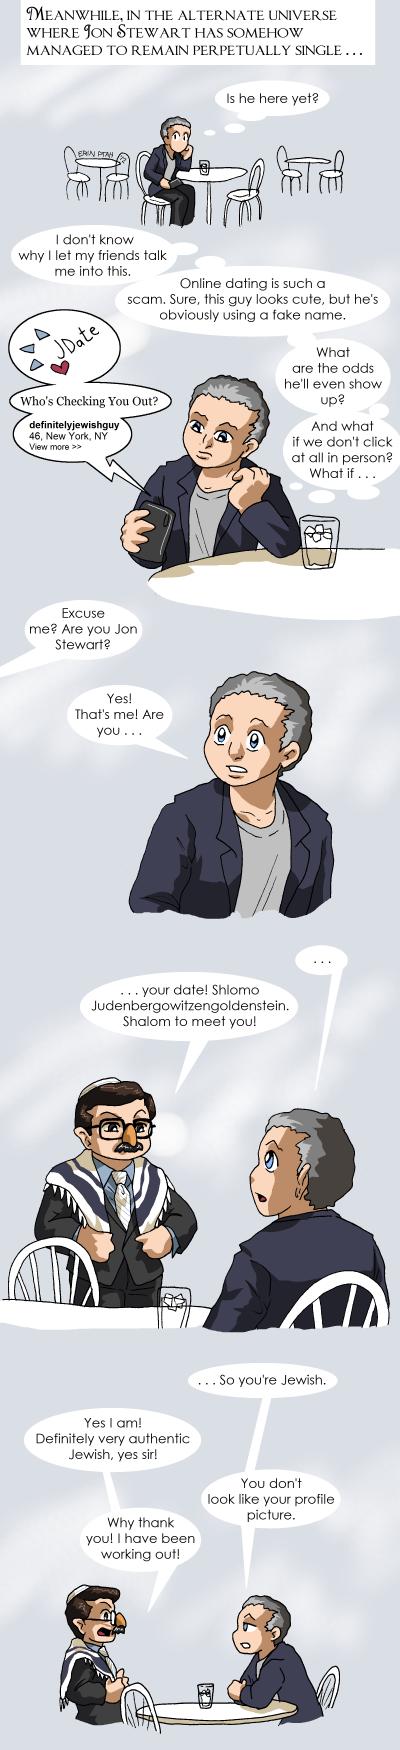 Jon's JDate Adventure by ErinPtah